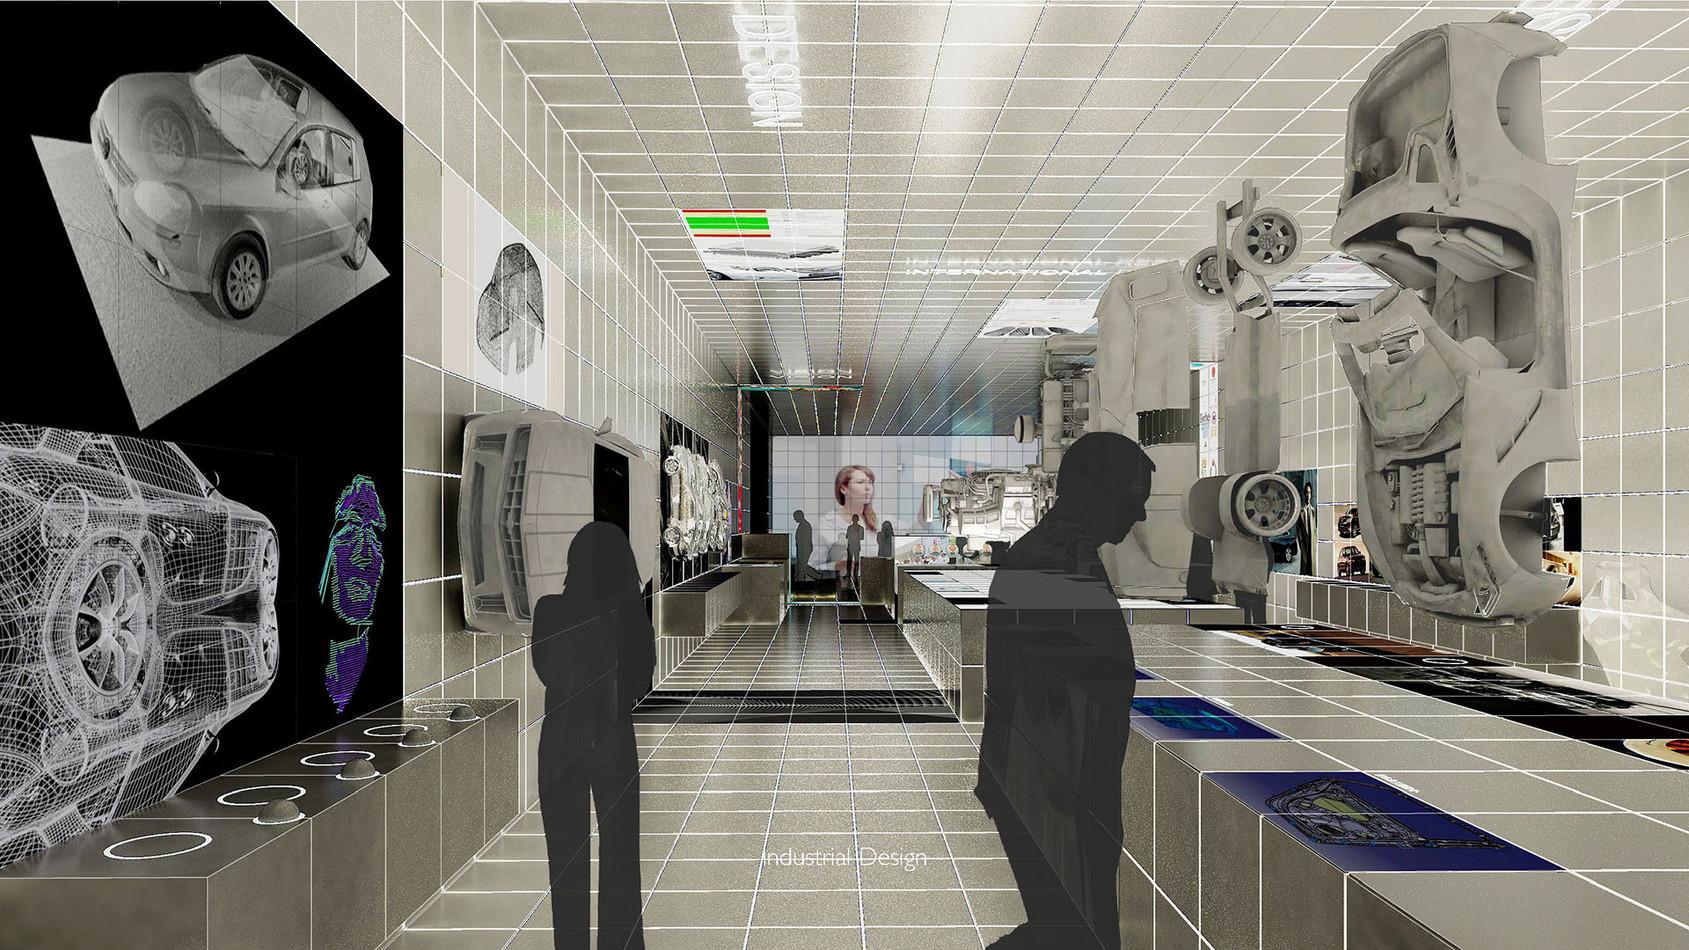 SGM-CORPORATE-MUSEUM-EN 23.jpg